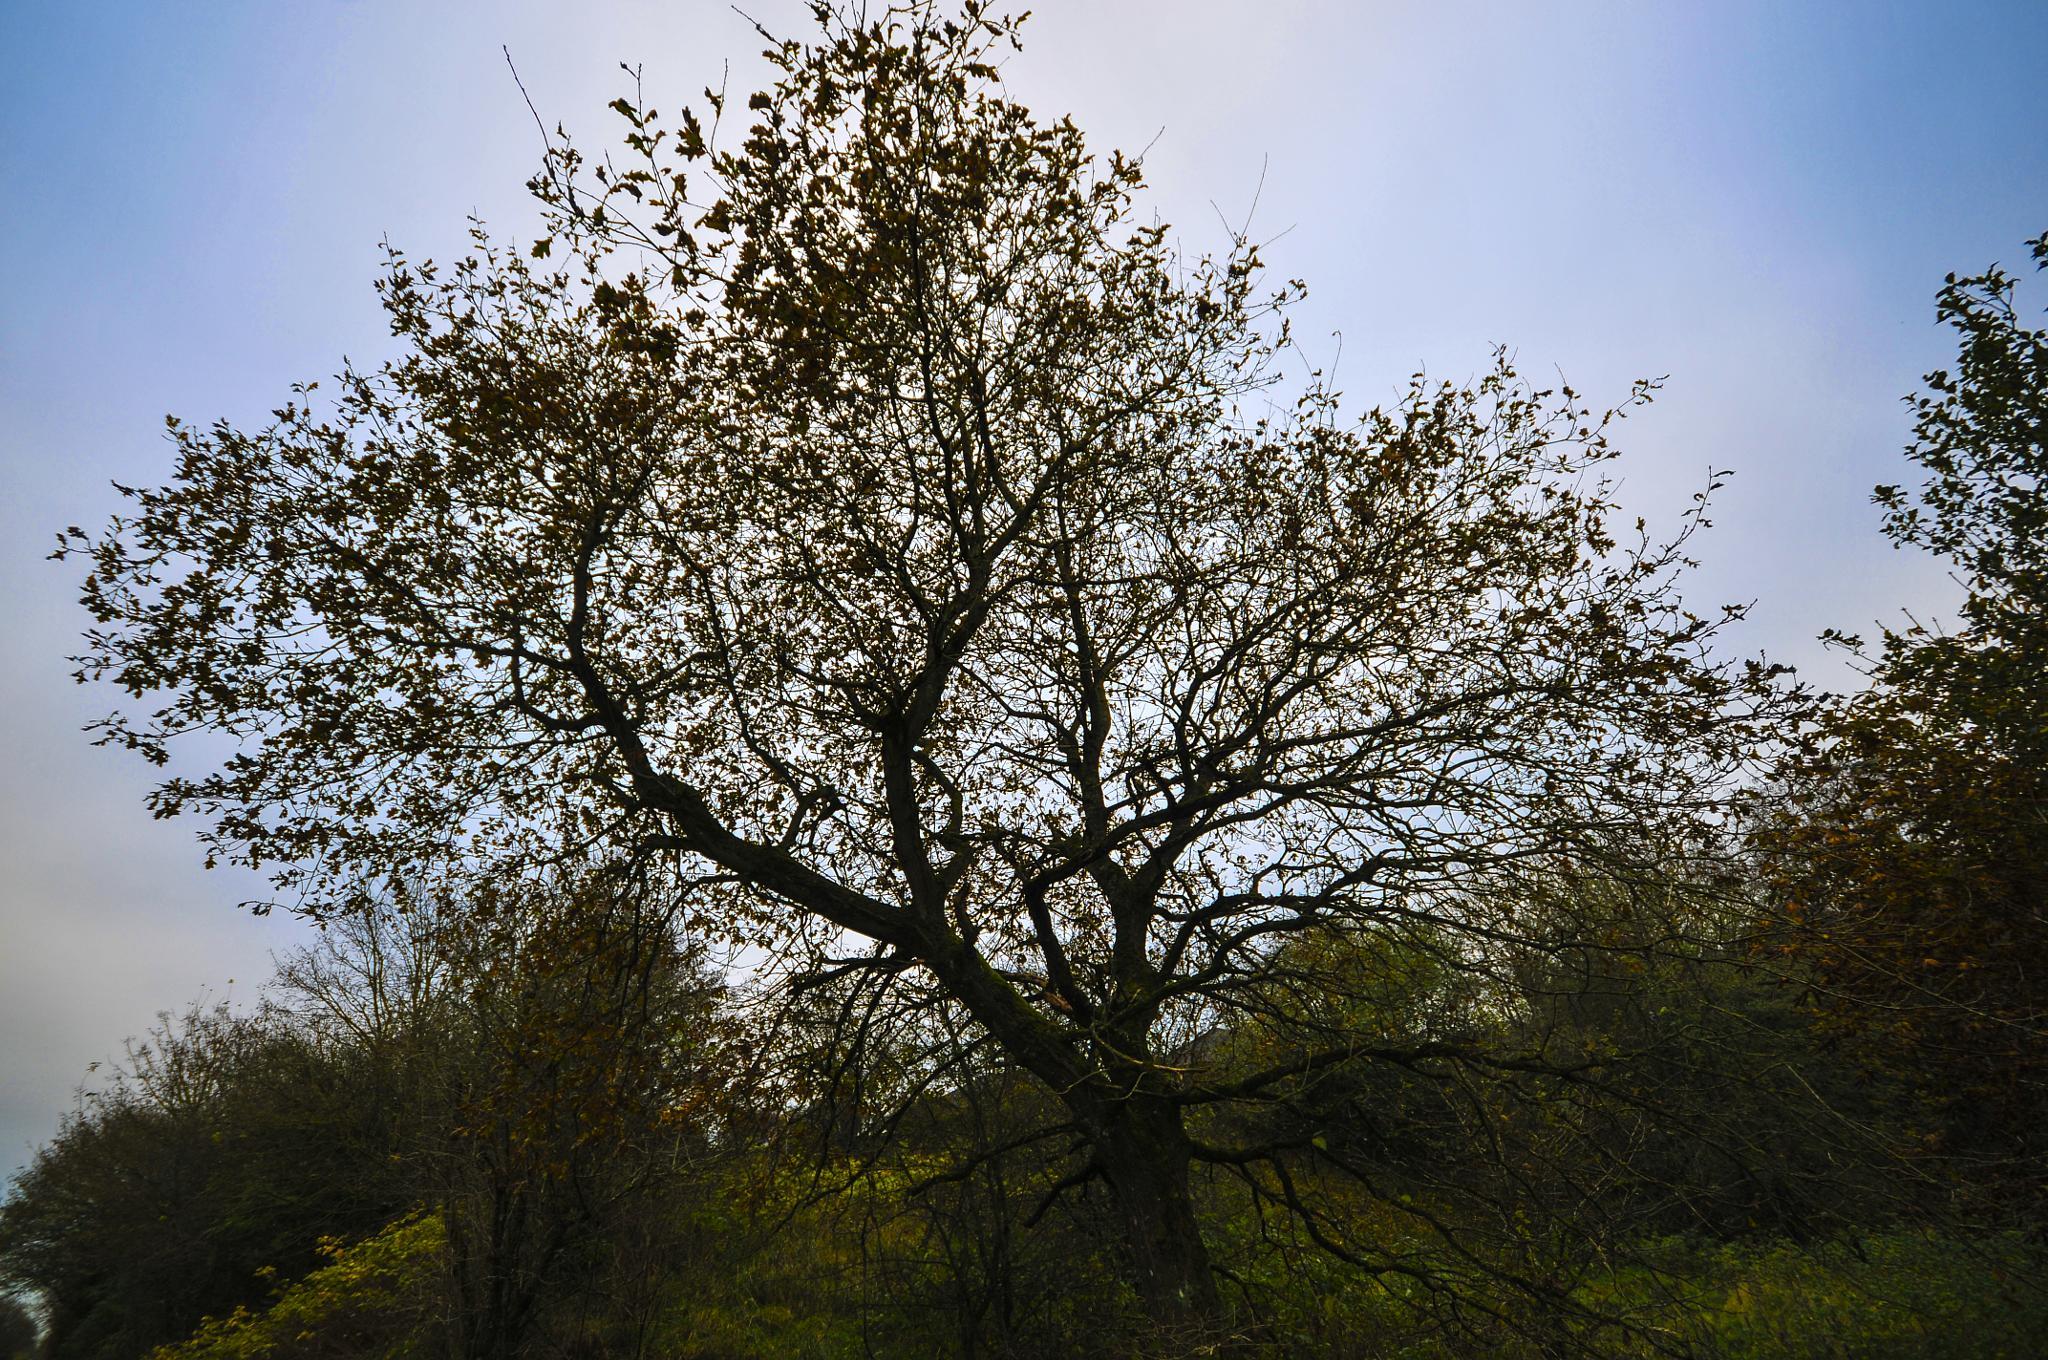 A BIG ol' tree by Steen Skov